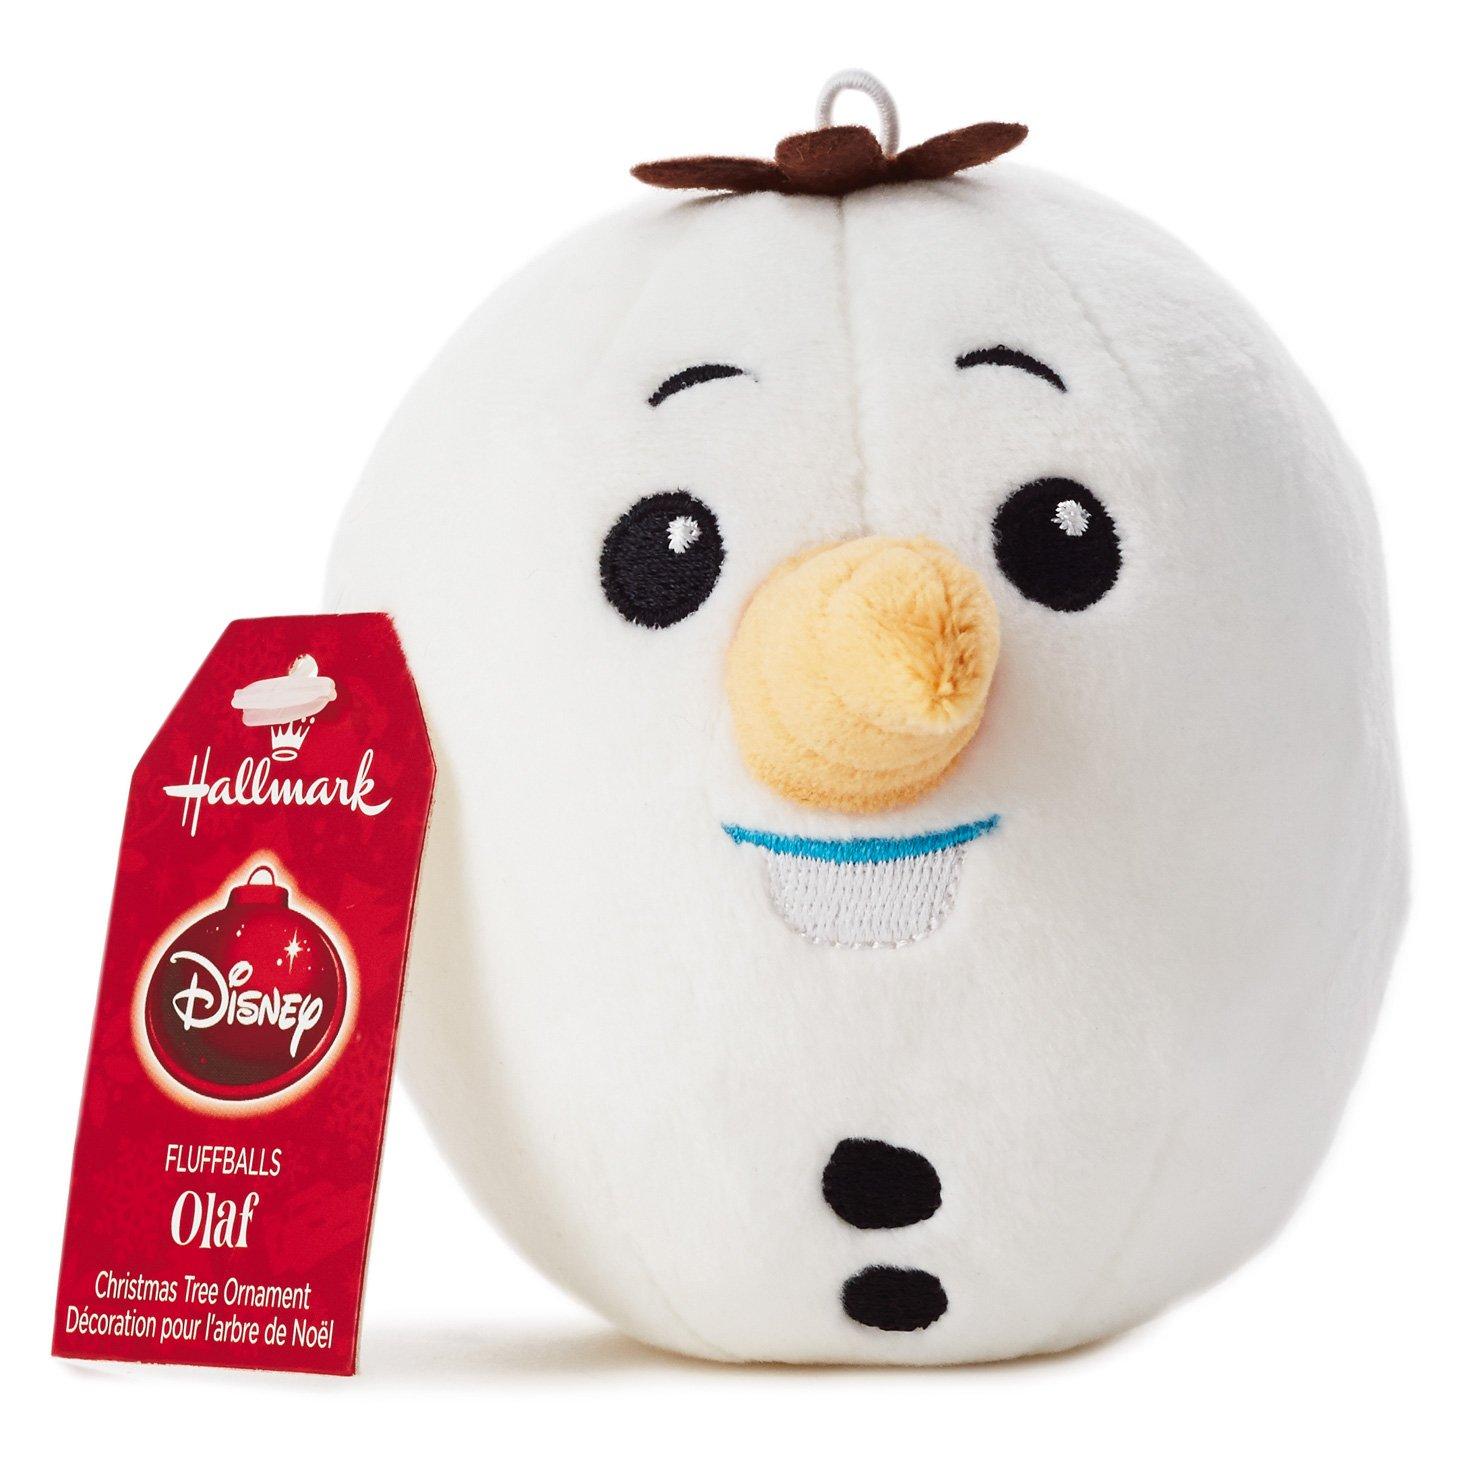 Amazon.com: Hallmark Disney Frozen Olaf Fluff Ball Ornament: Home ...